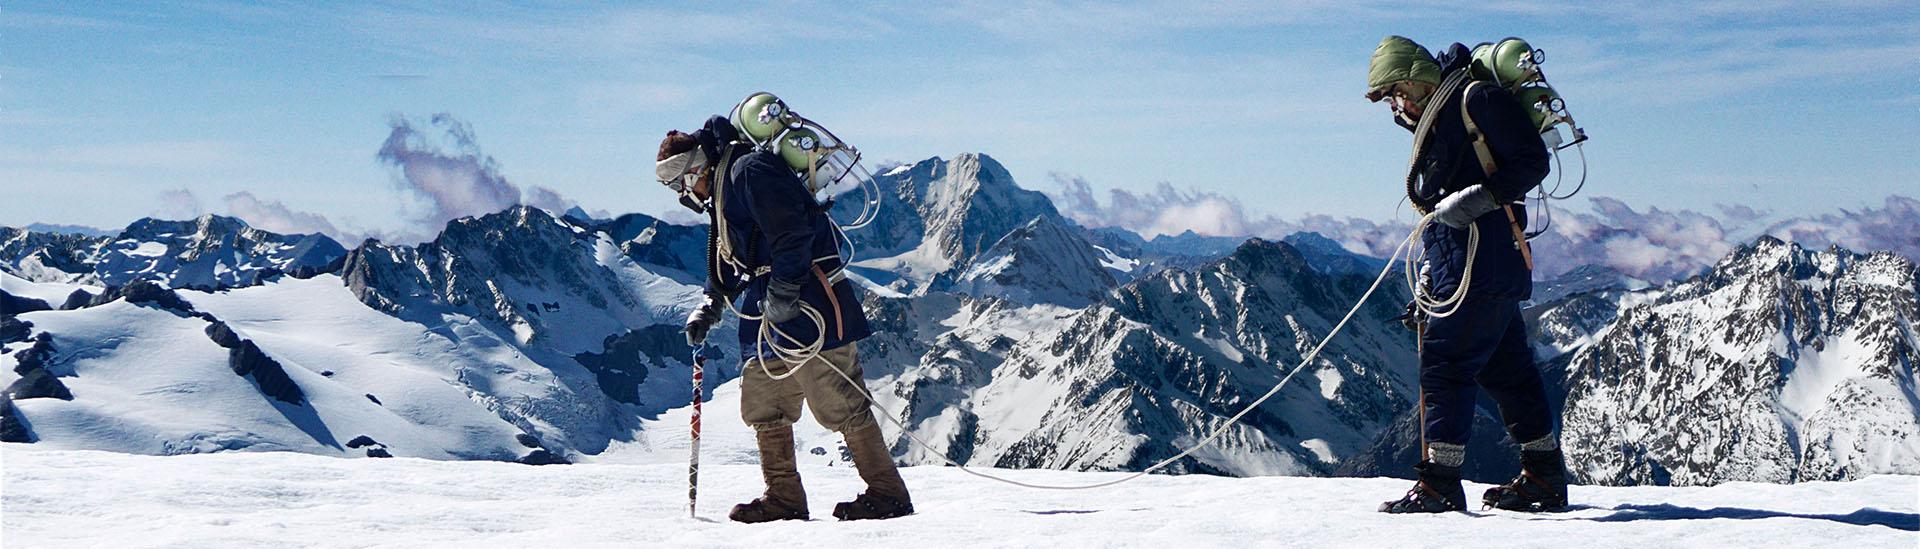 Baner filmu 'Everest - Poza Krańcem Świata'